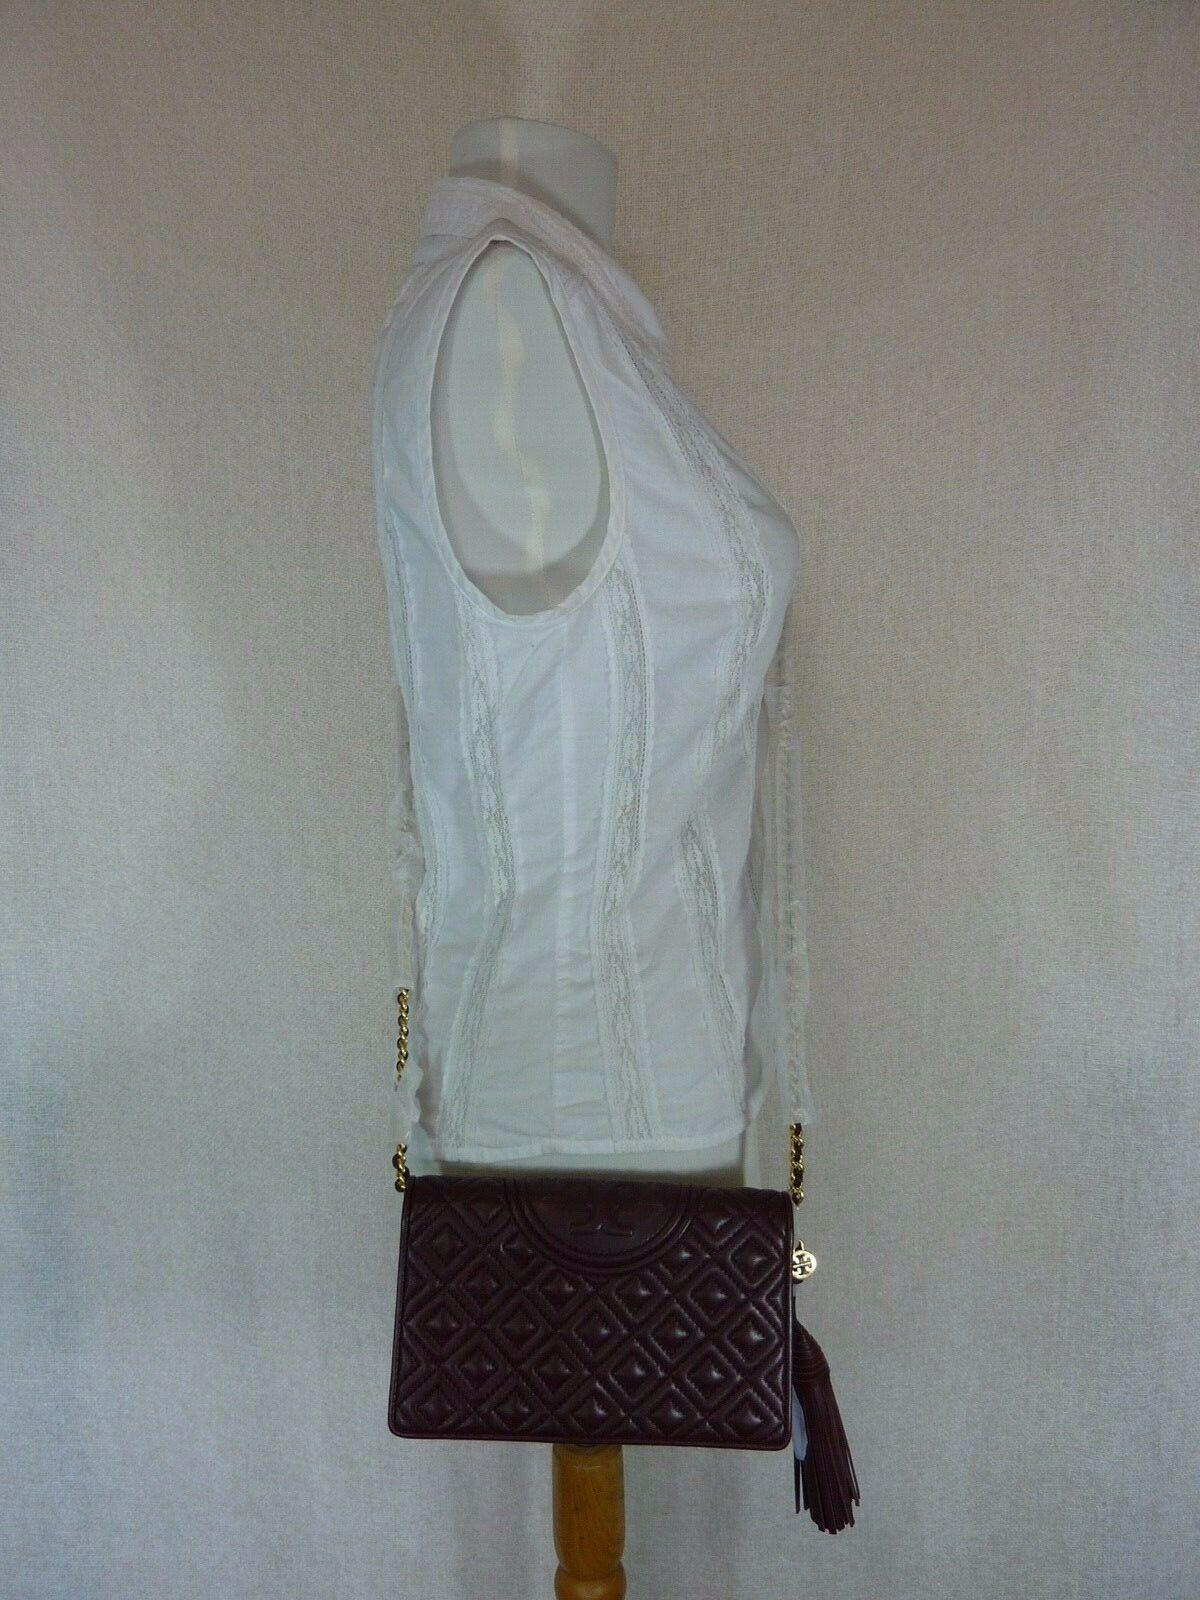 NWT Tory Burch Claret Fleming Wallet Cross Body Bag $328 image 10